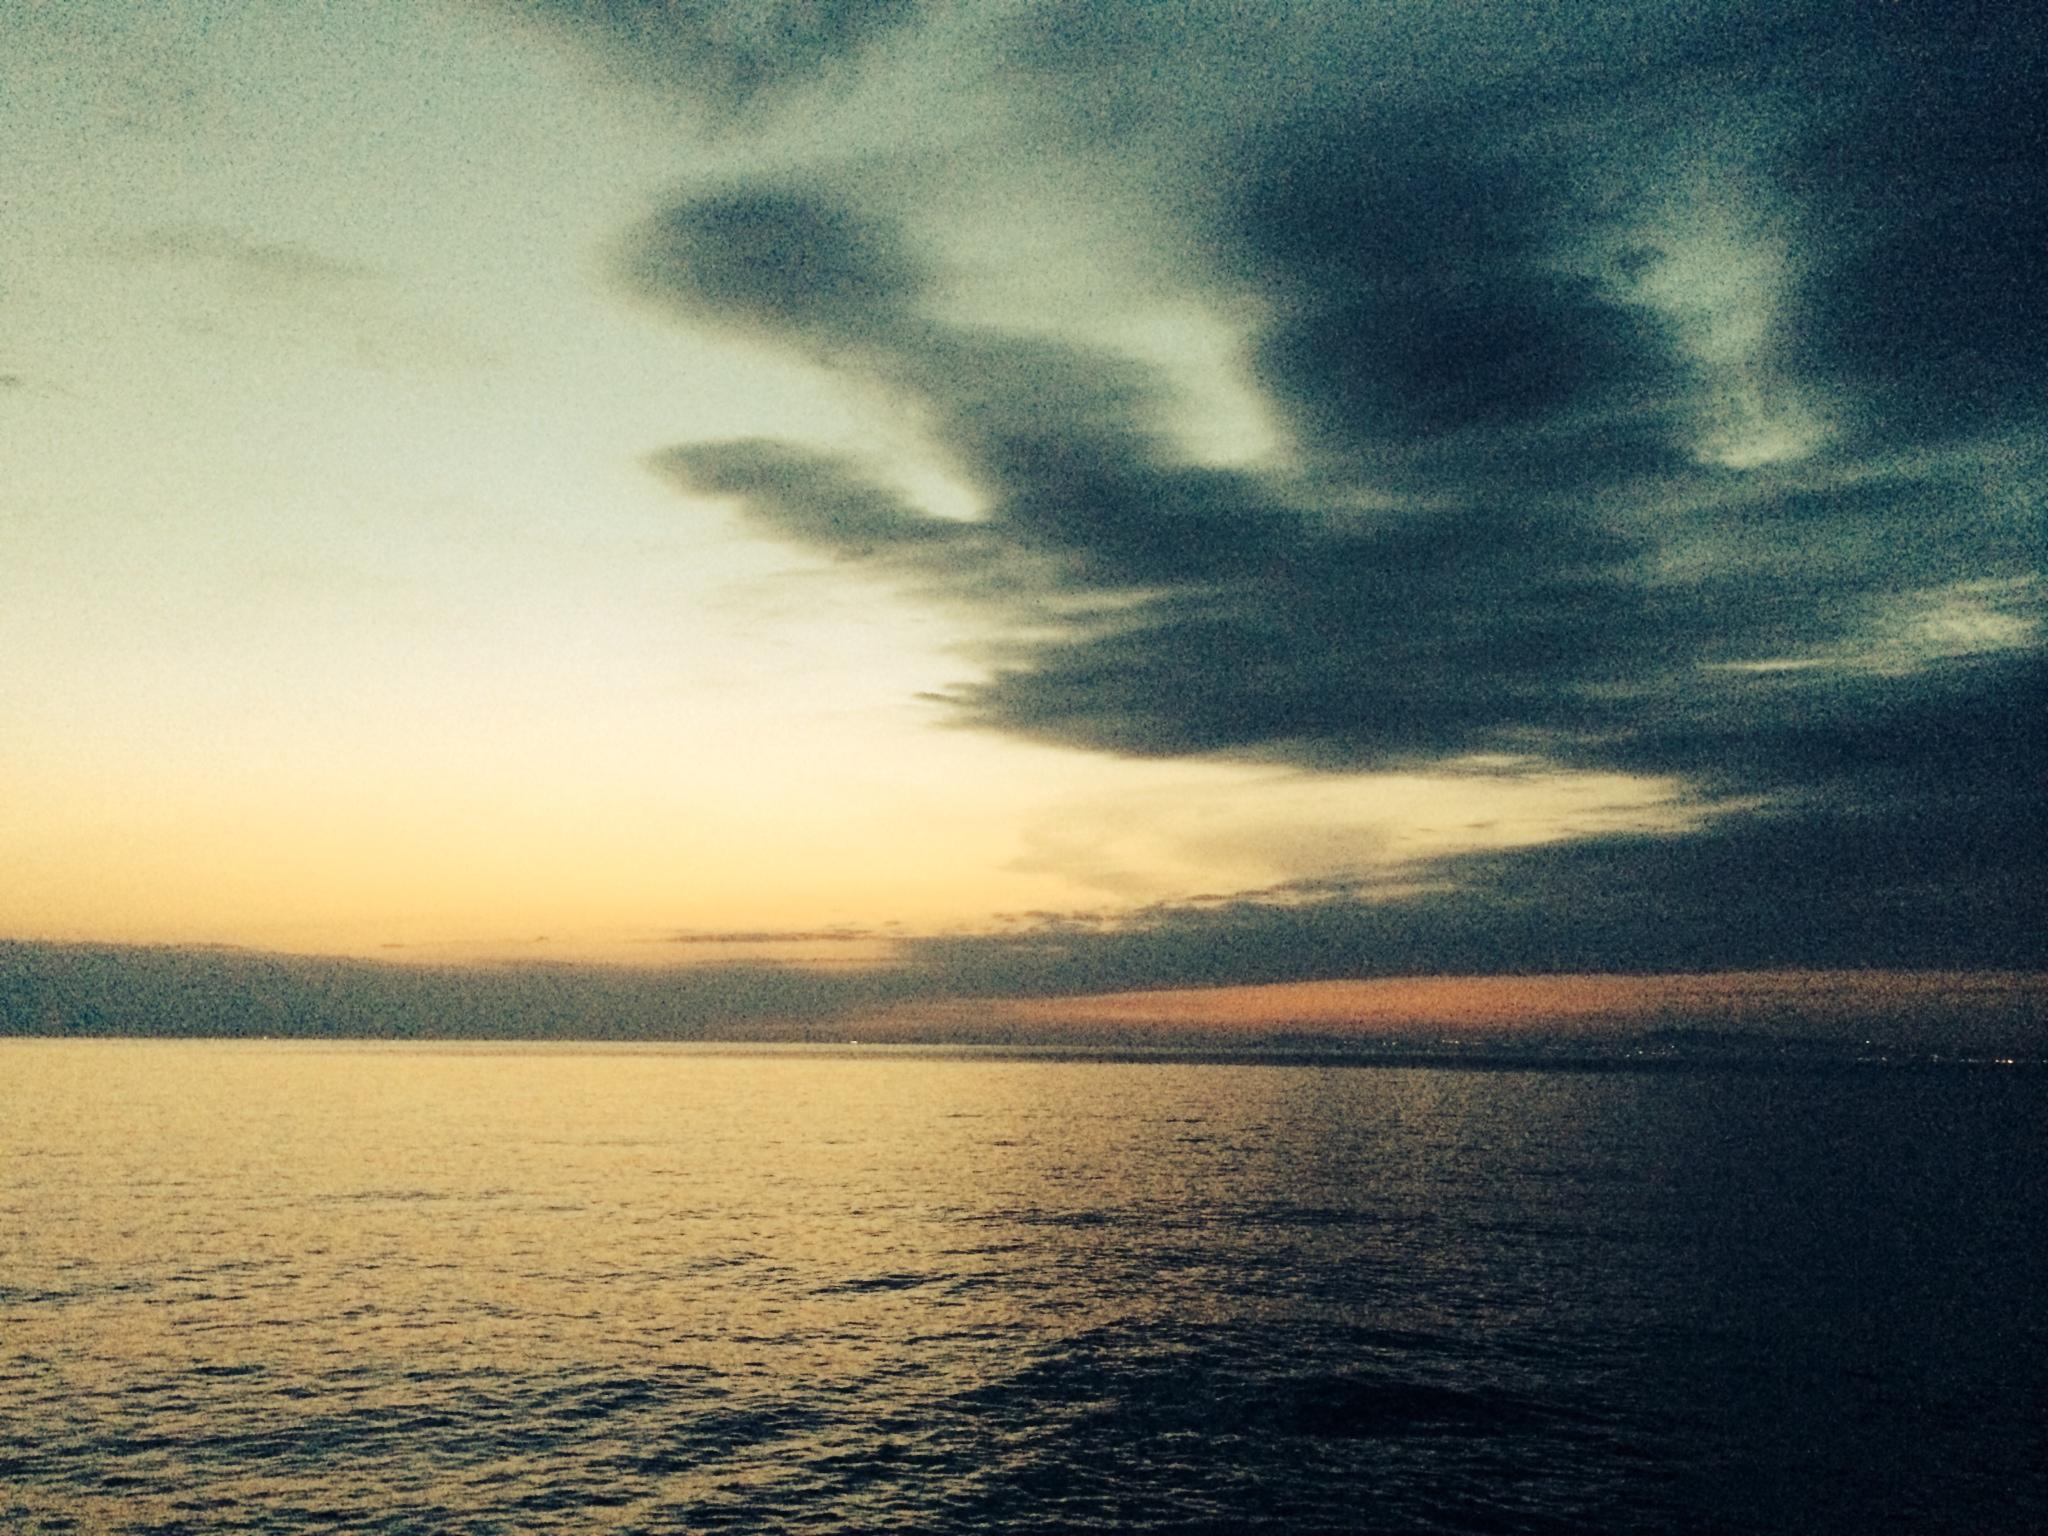 tramonto_sorrento.JPG